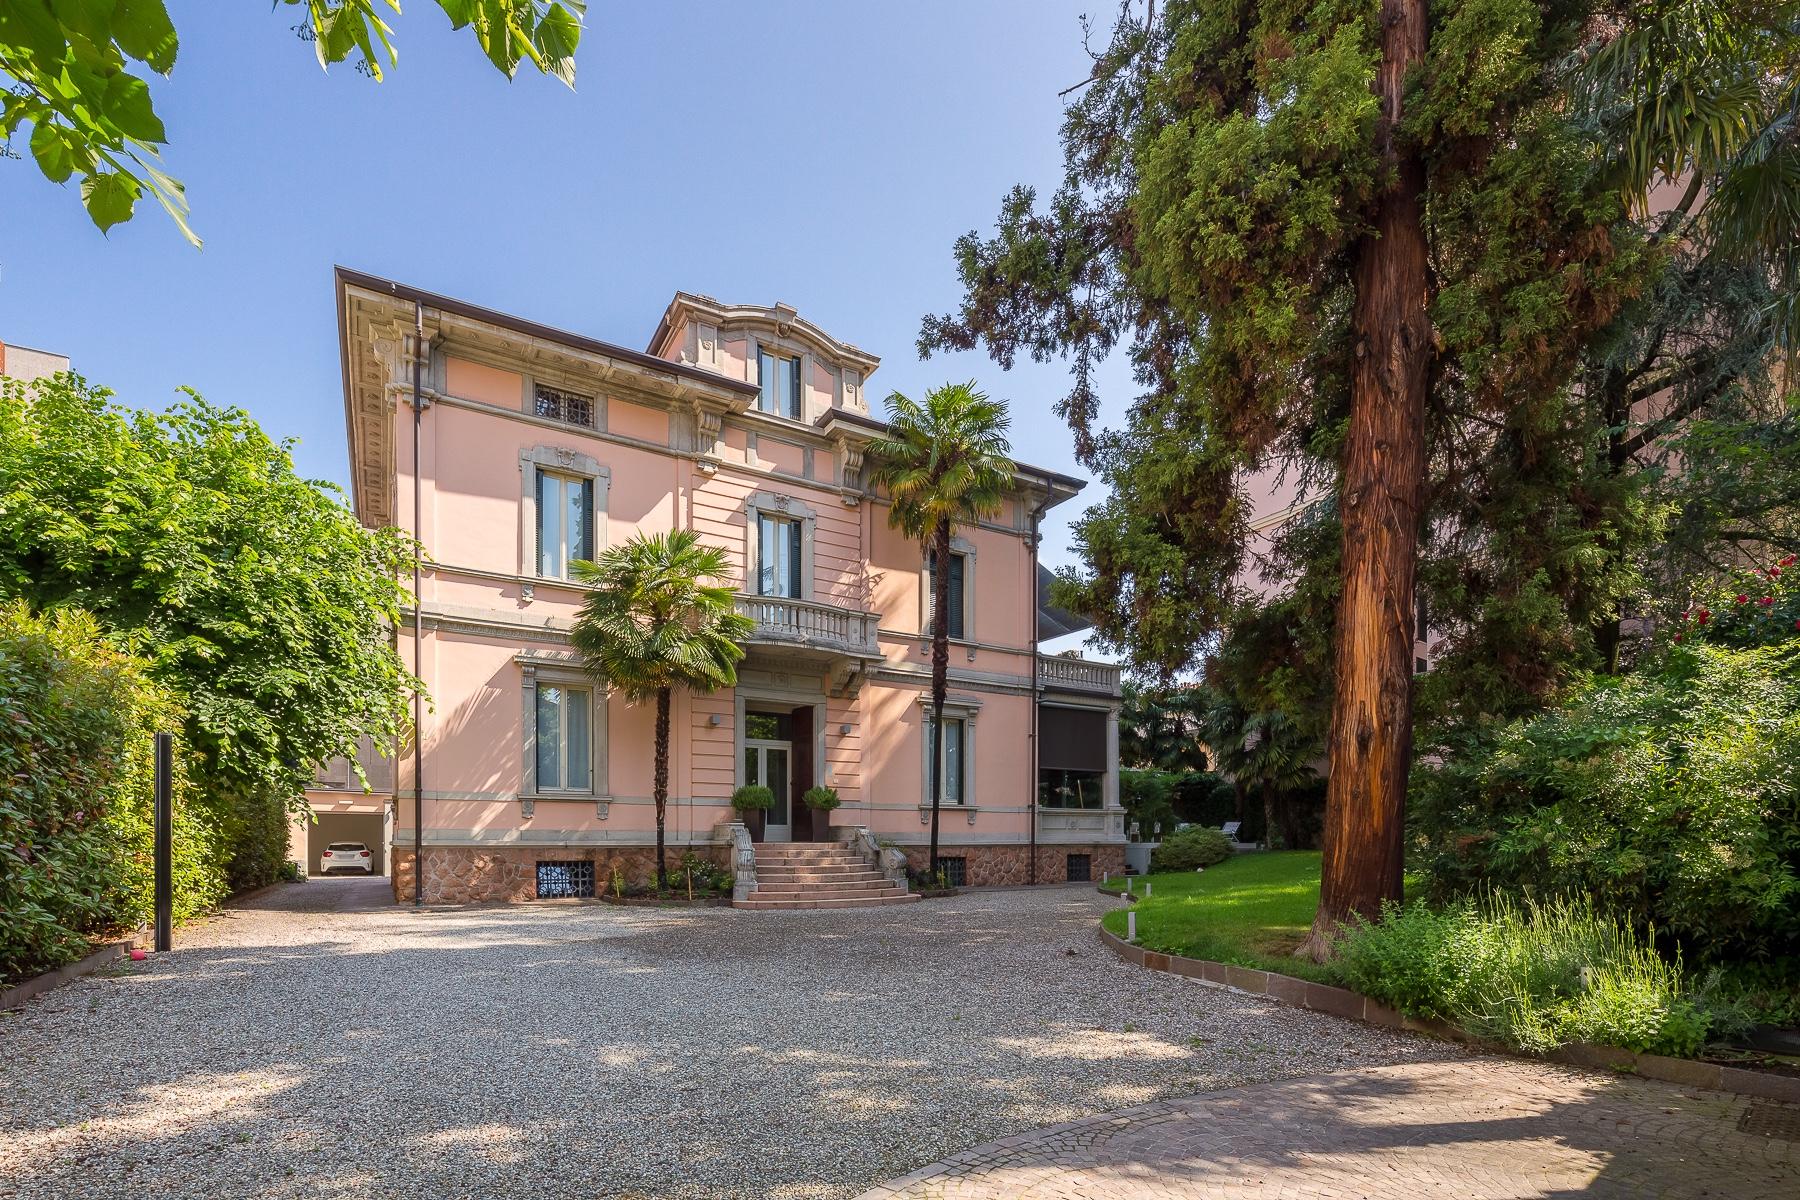 Villa in Vendita a Varese: 5 locali, 800 mq - Foto 3